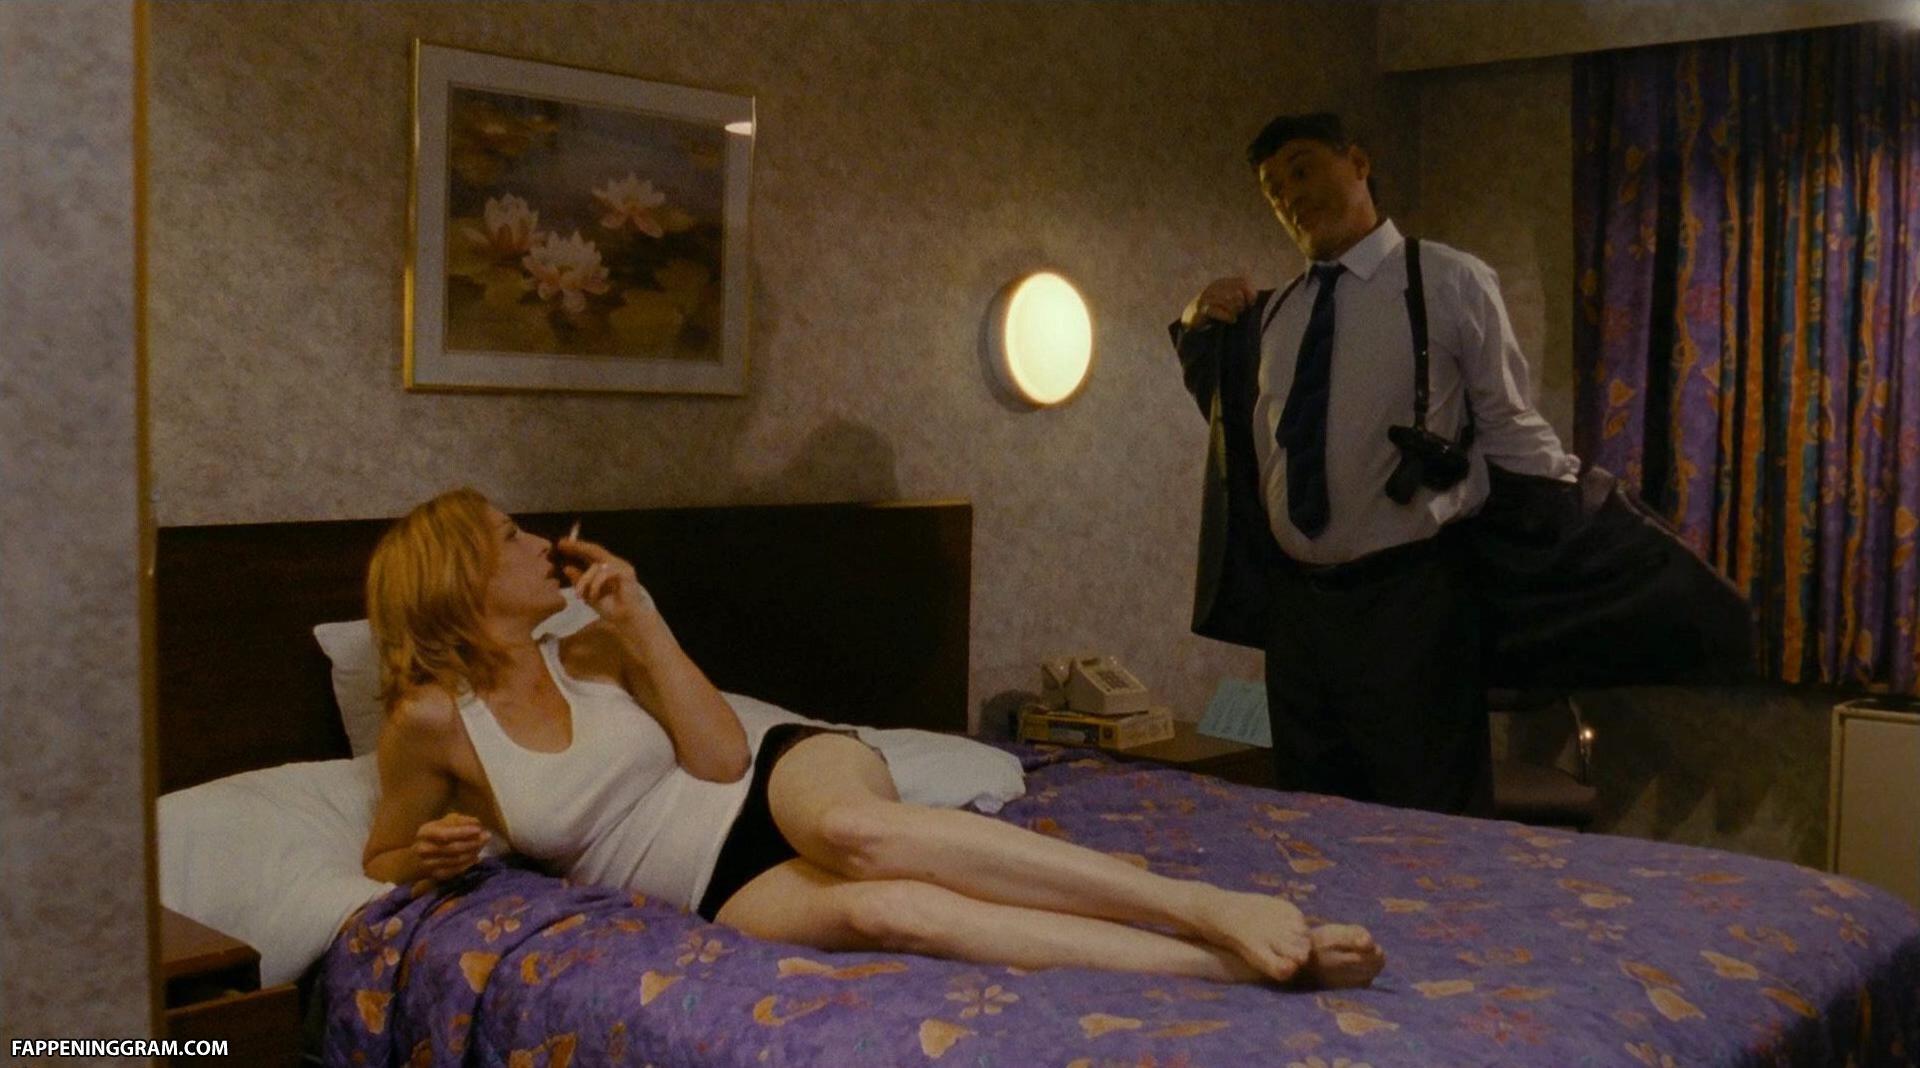 Tatum o'neal sex scene the scoundrel's wife